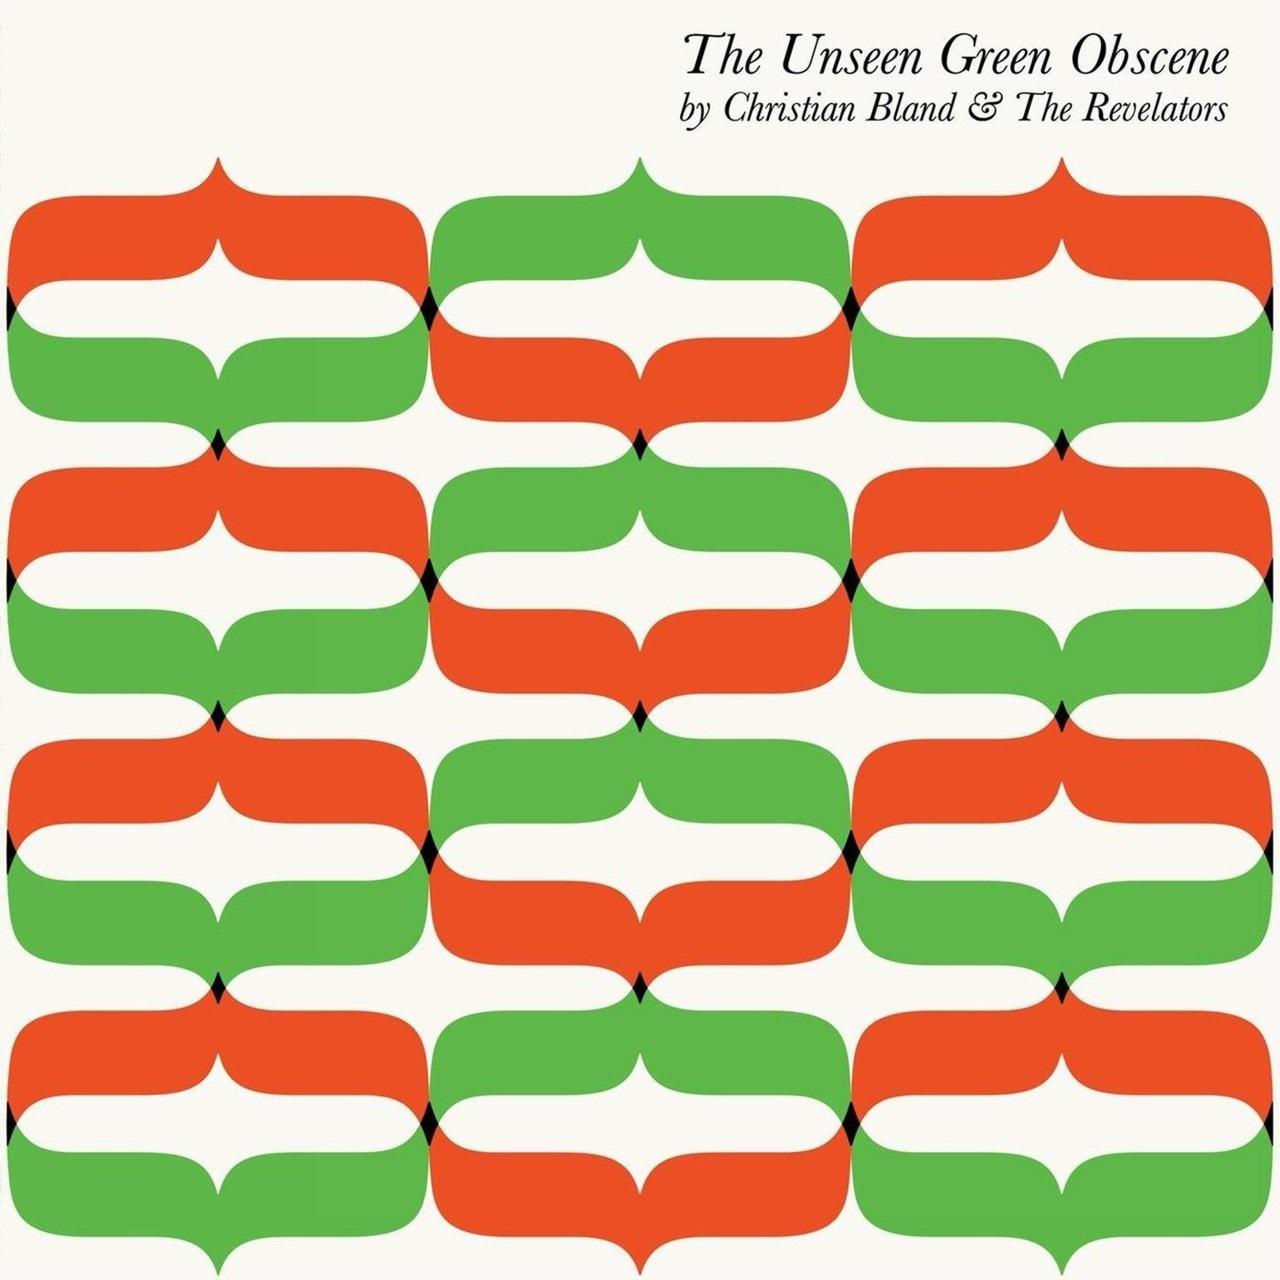 The Unseen Green Obscene - 1